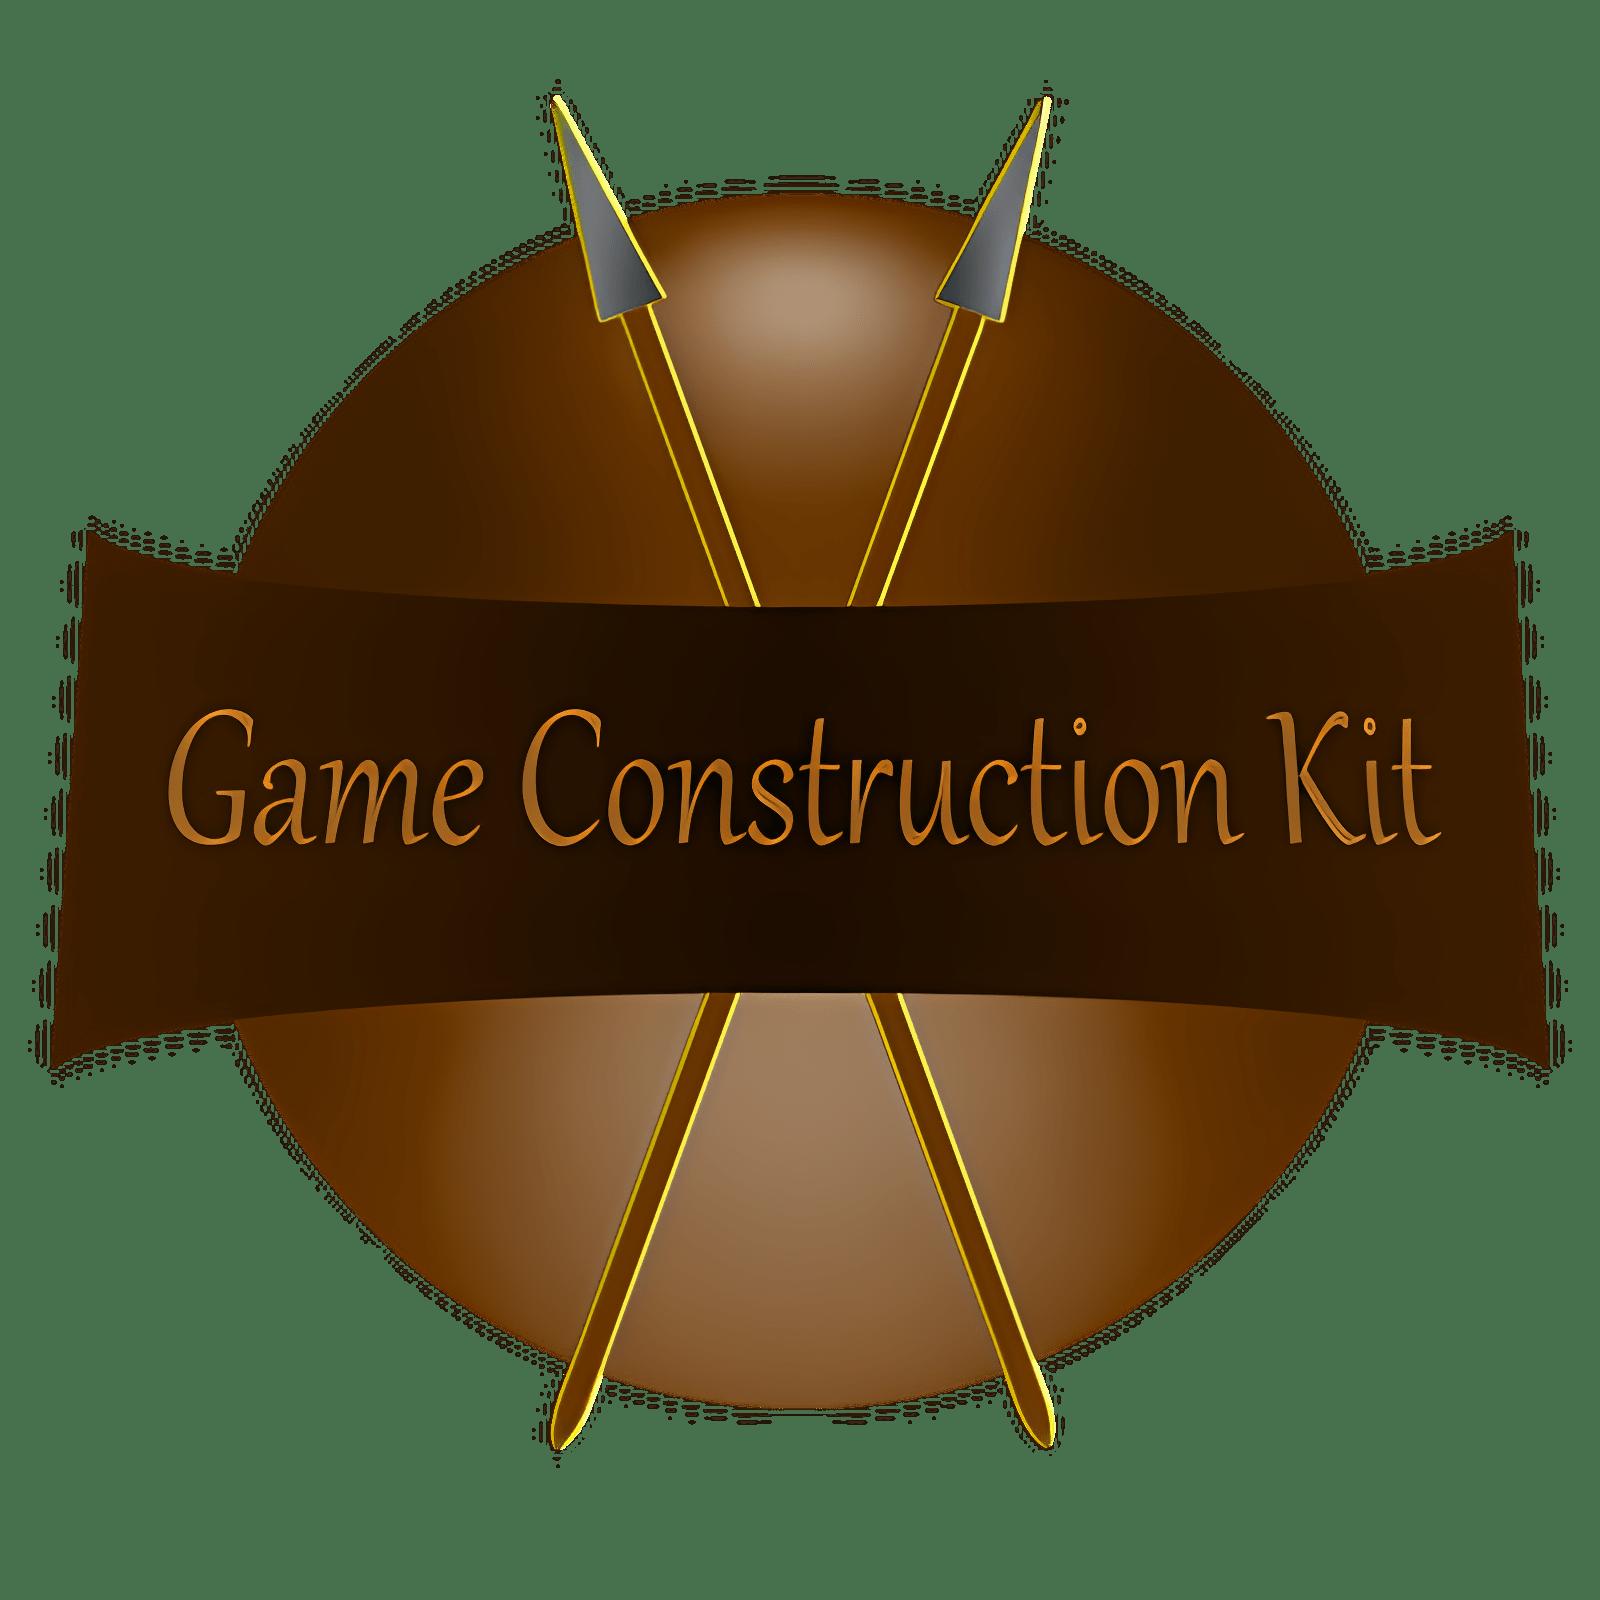 Game Construction Kit